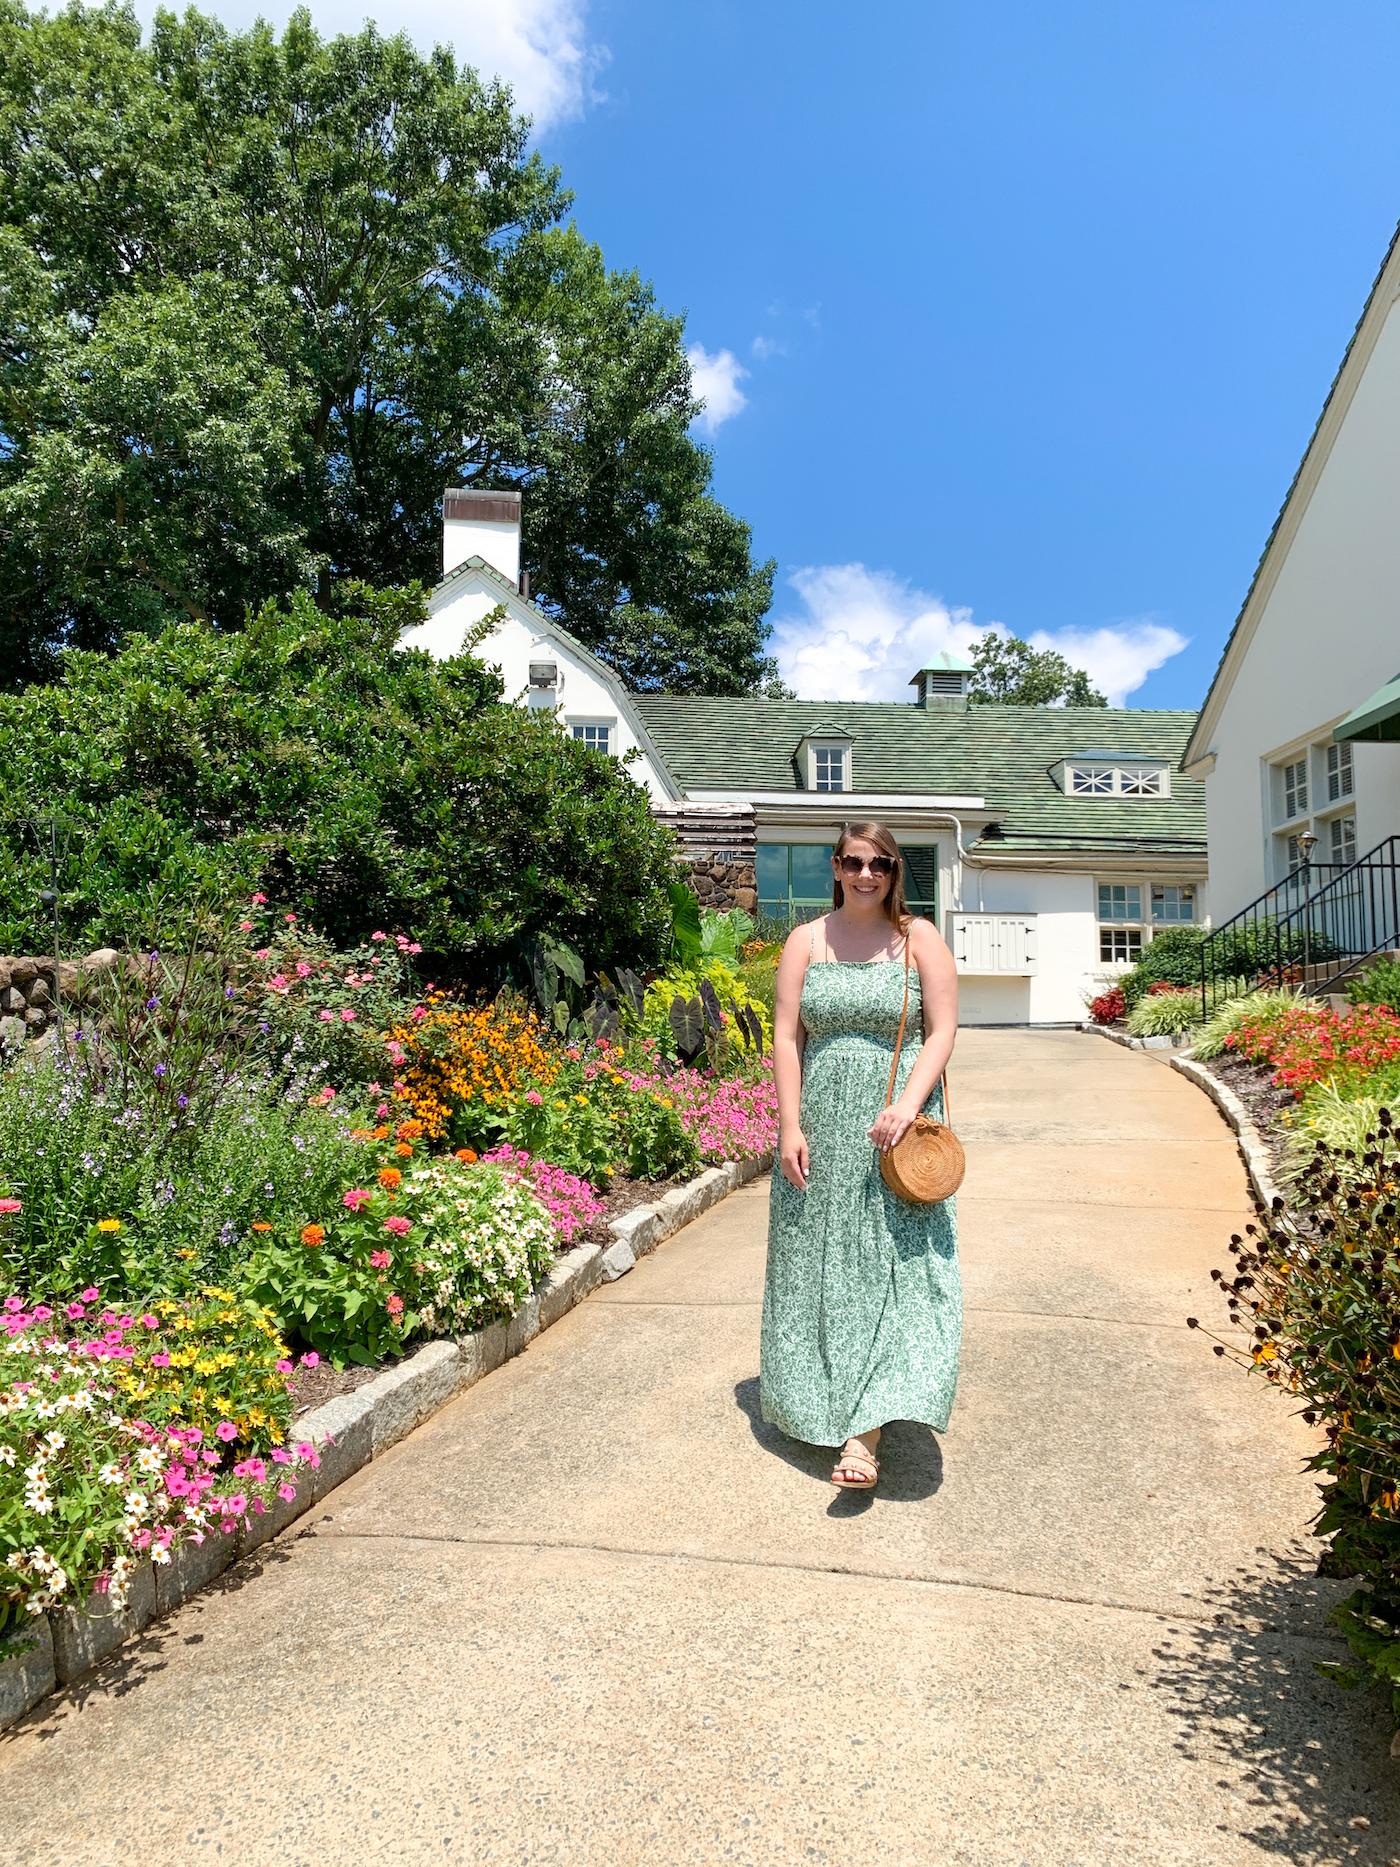 Winston Salem, North Carolina girls weekend guide